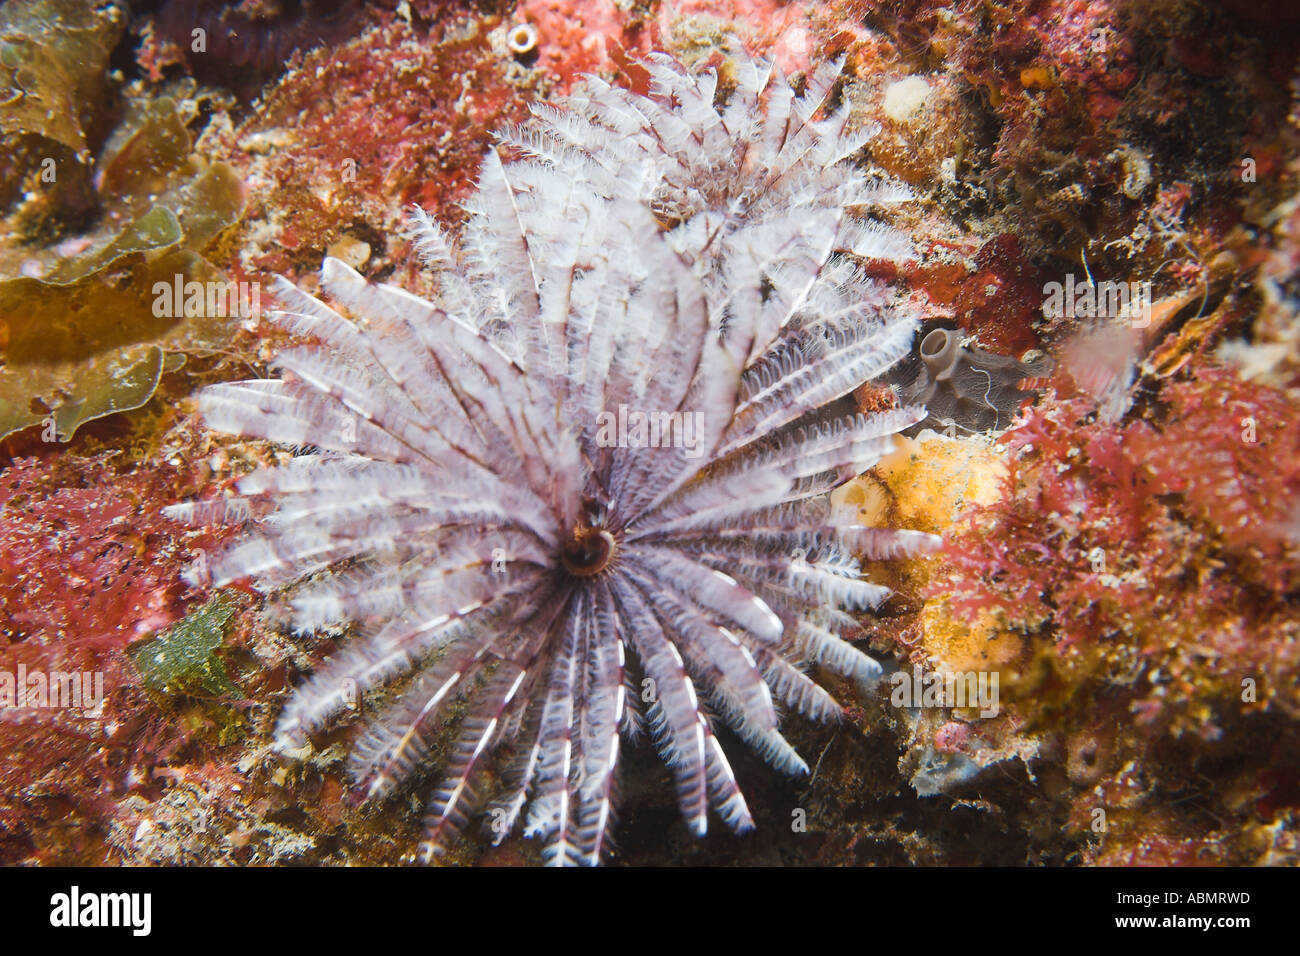 Feather Worm Sabellidae Jeju Do South Korea East Sea Or Sea Of Japan